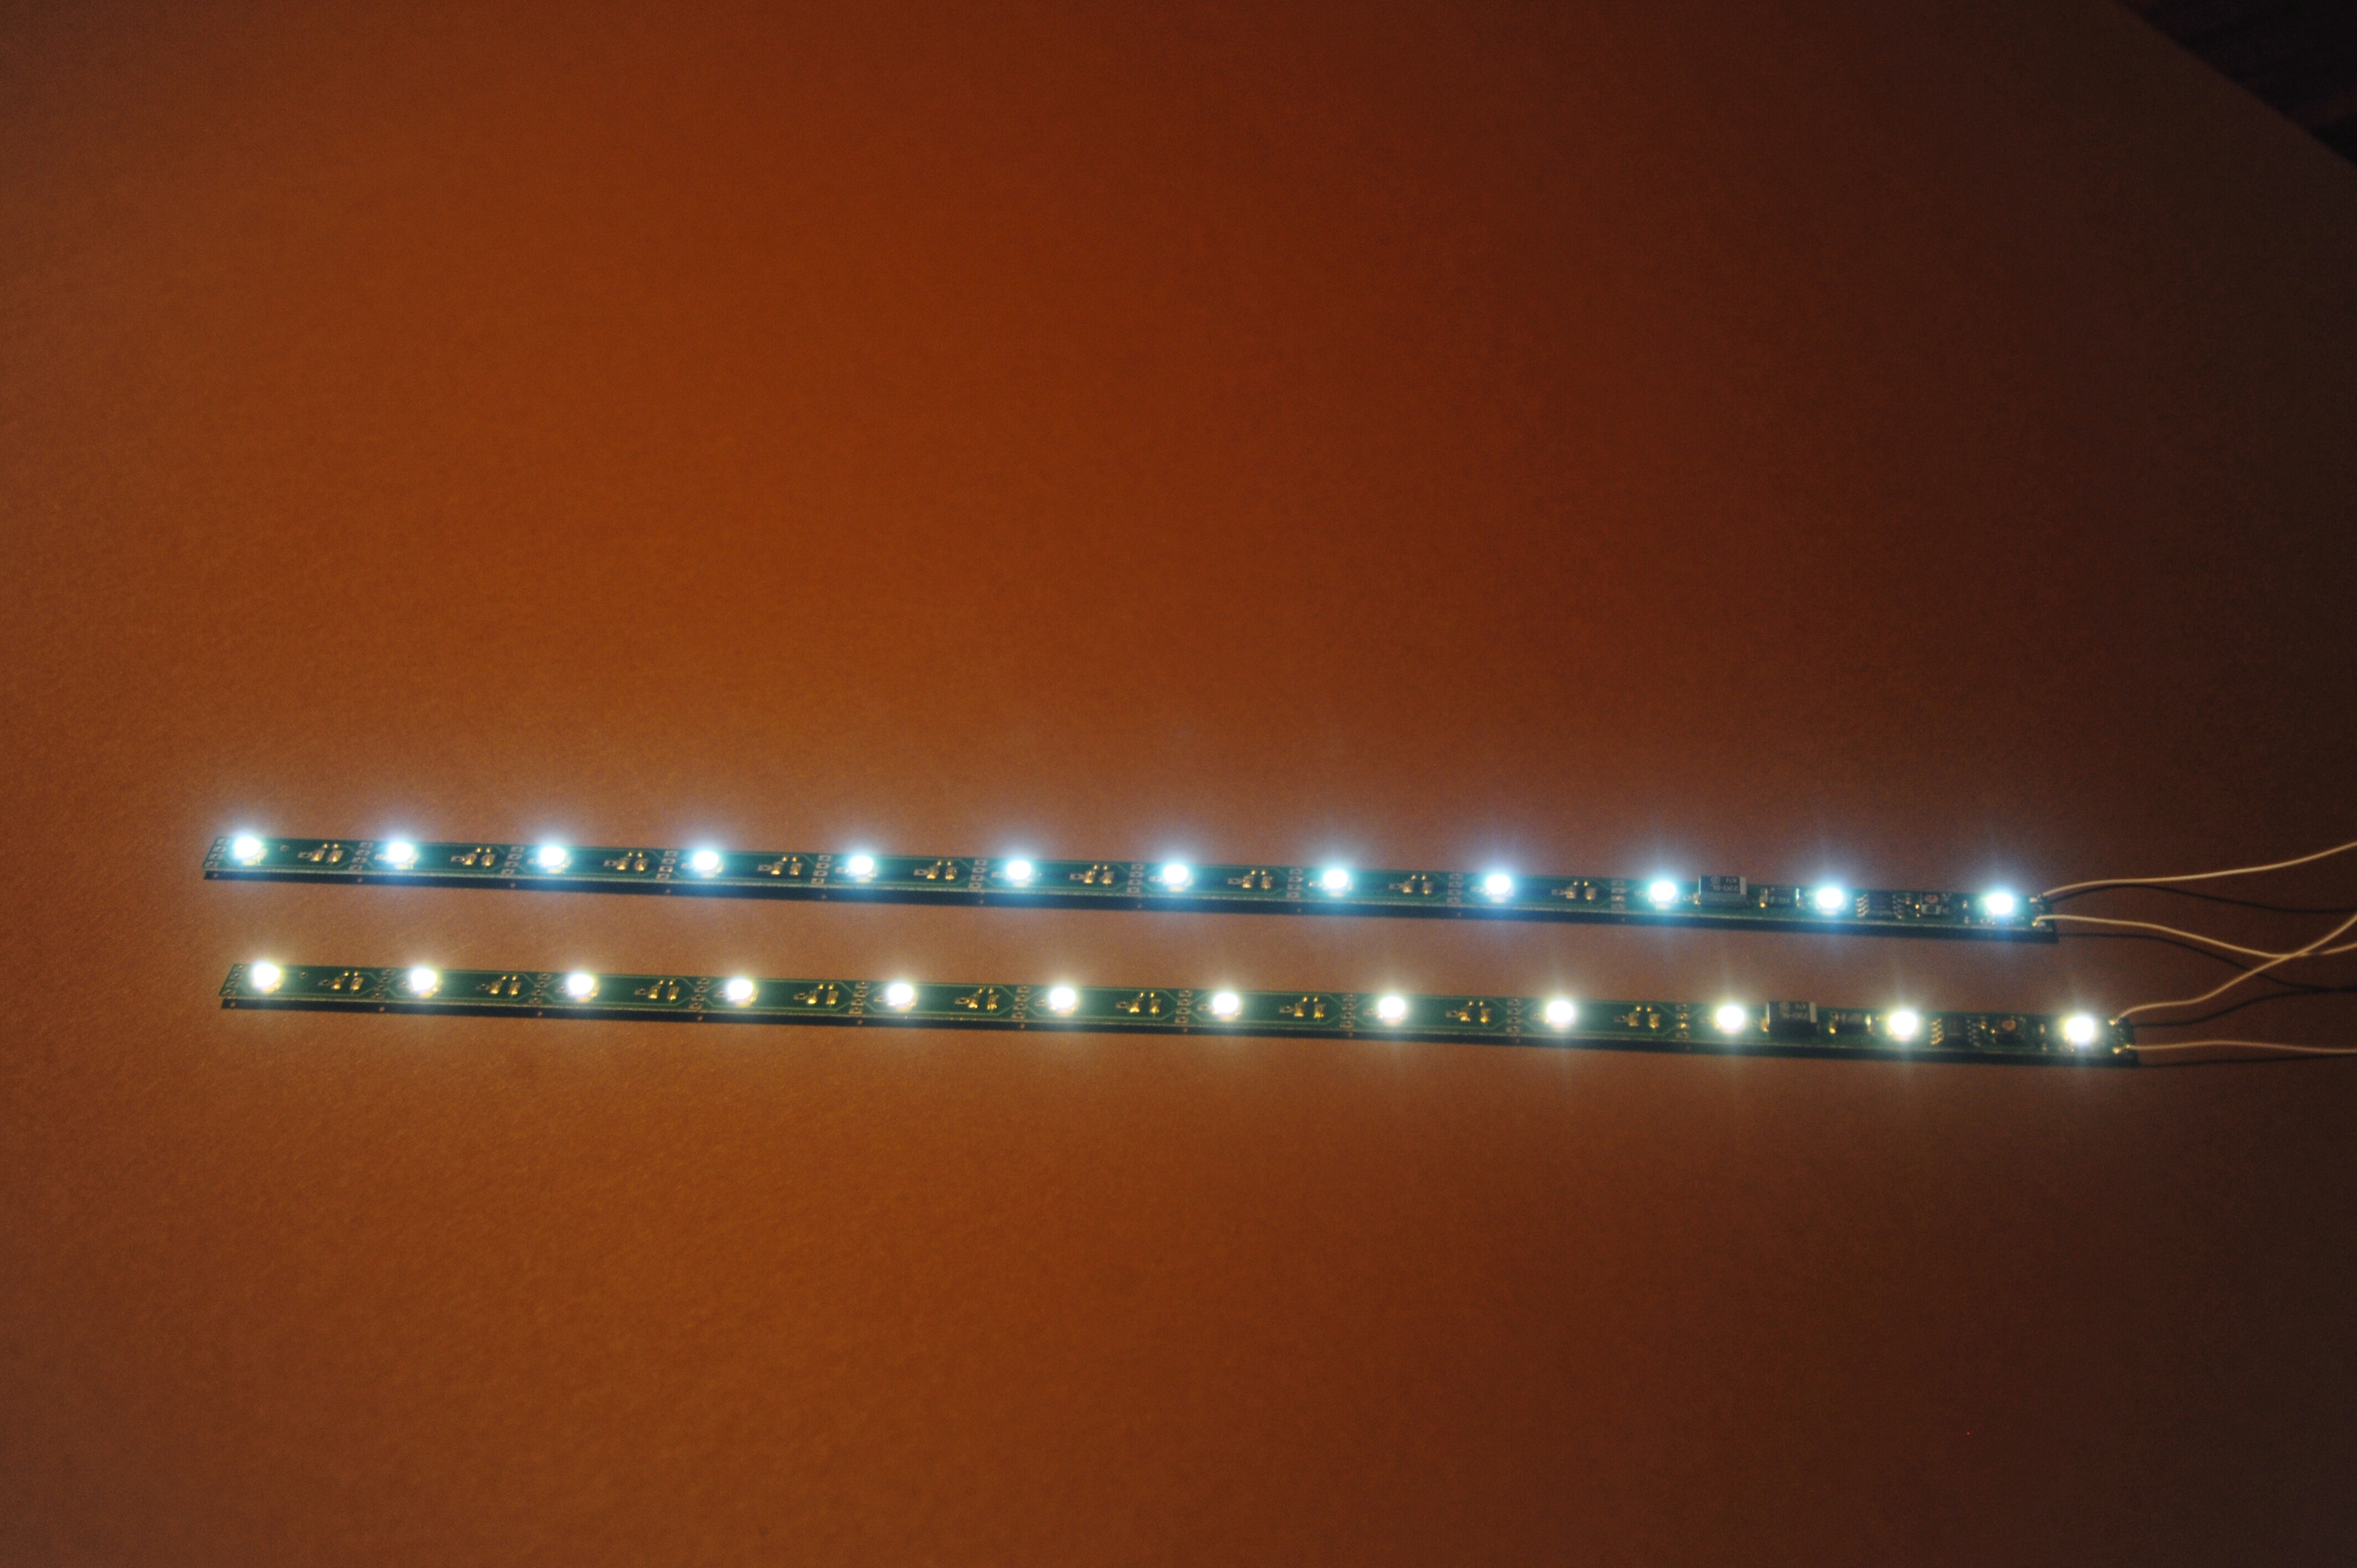 ms 11144 led lichtleiste warmwei 290 mm menzels lokschuppen onlineshop. Black Bedroom Furniture Sets. Home Design Ideas